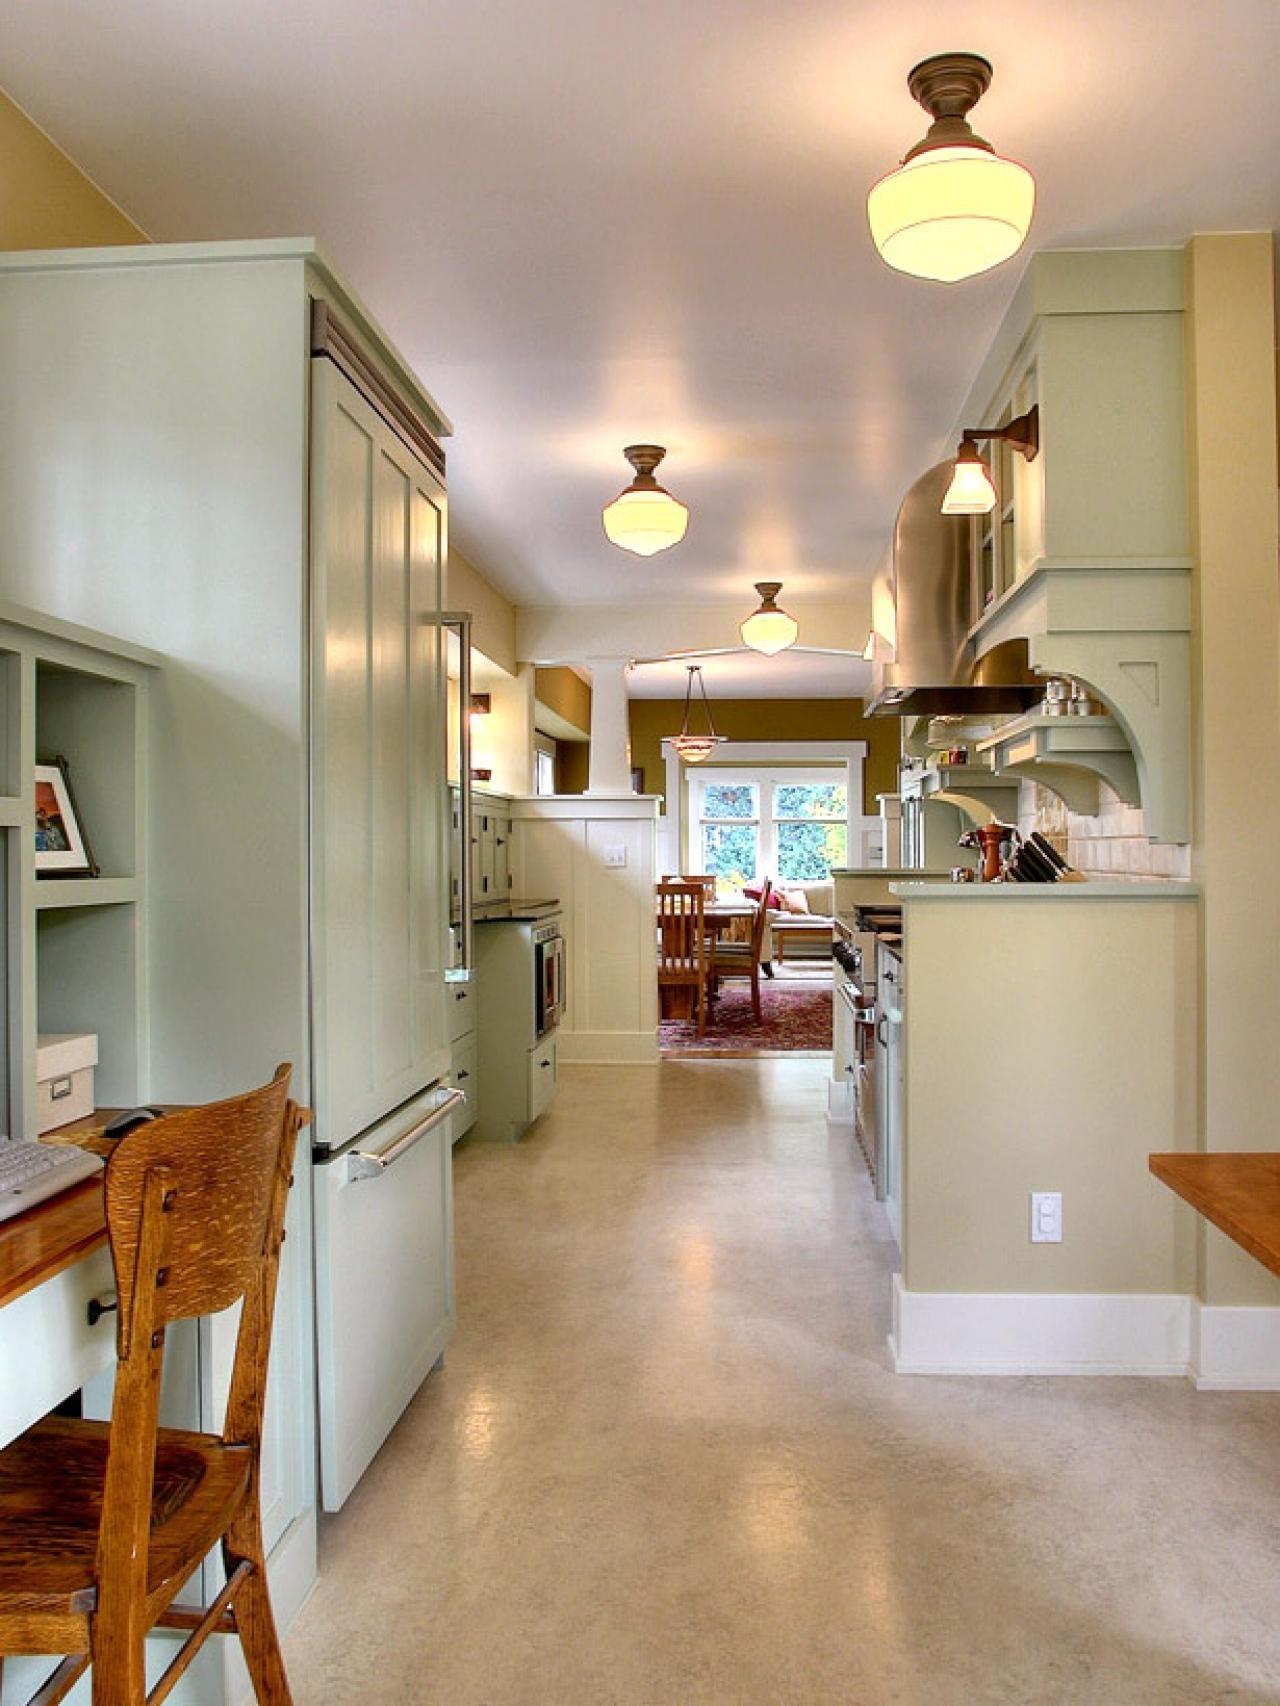 10 Unique Kitchen Lighting Ideas Small Kitchen %name